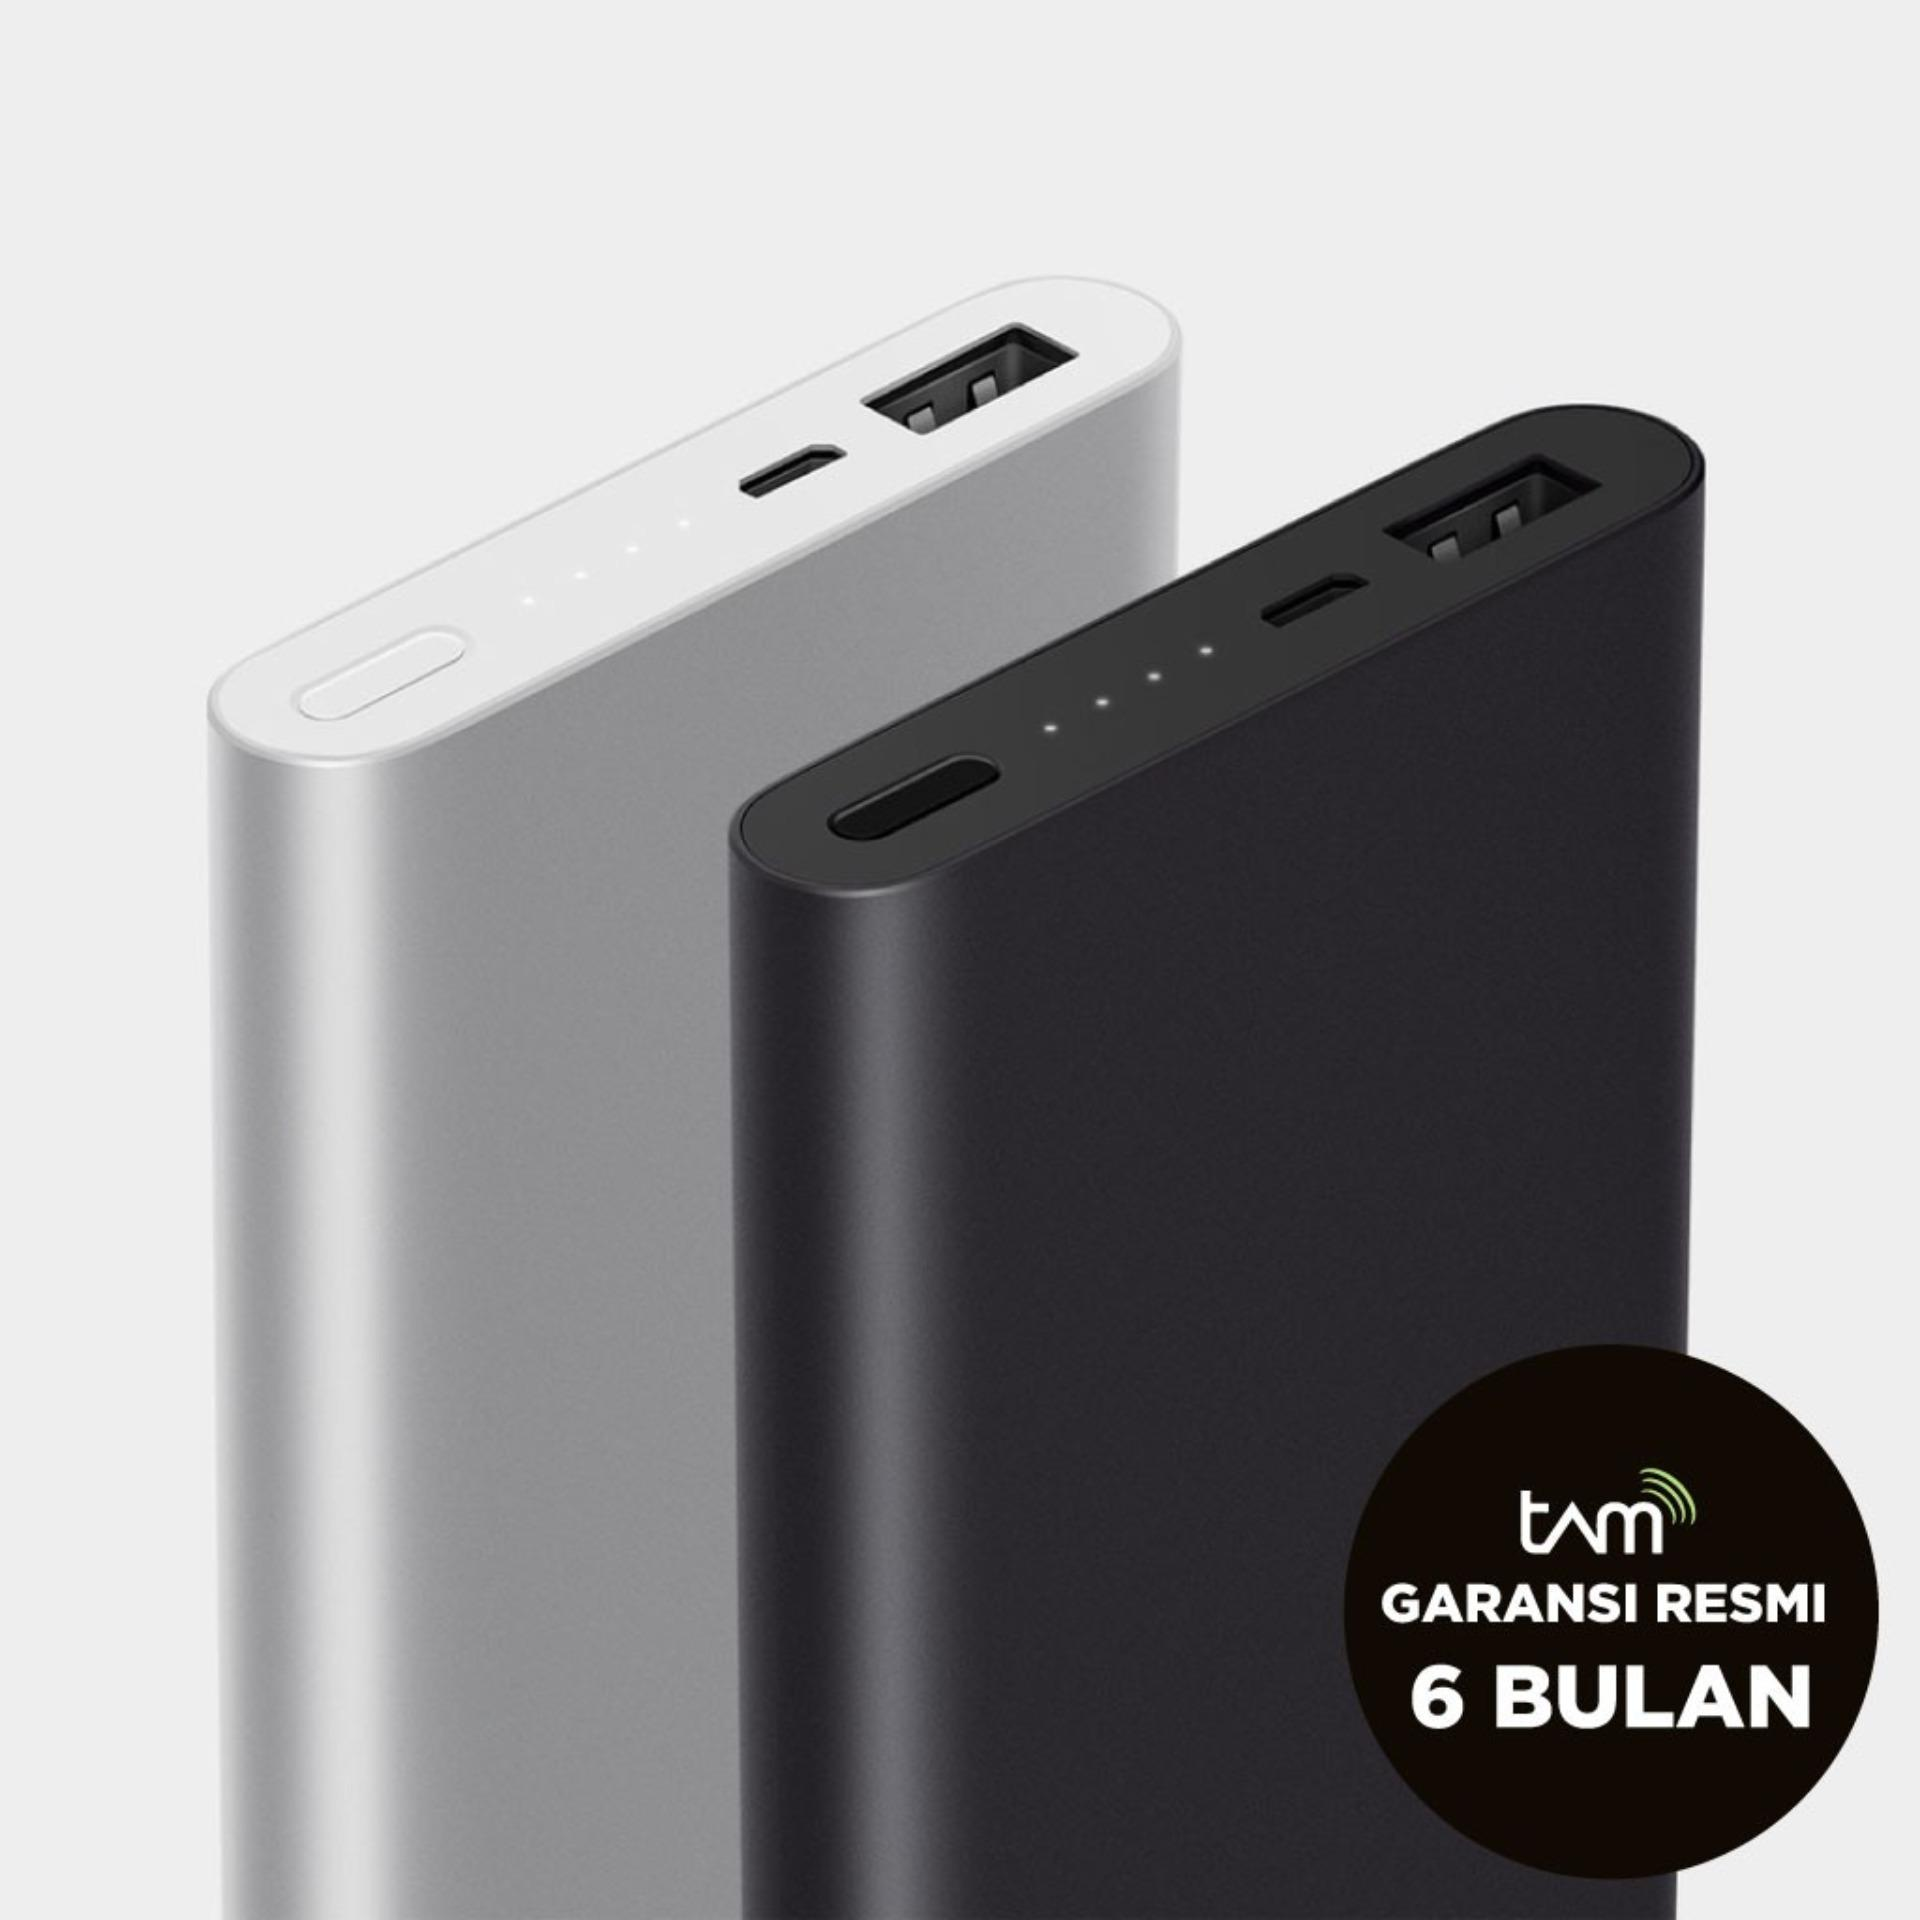 Xiaomi powerbank 10000mAH Gen 2 original segel TAM Garansi resmi